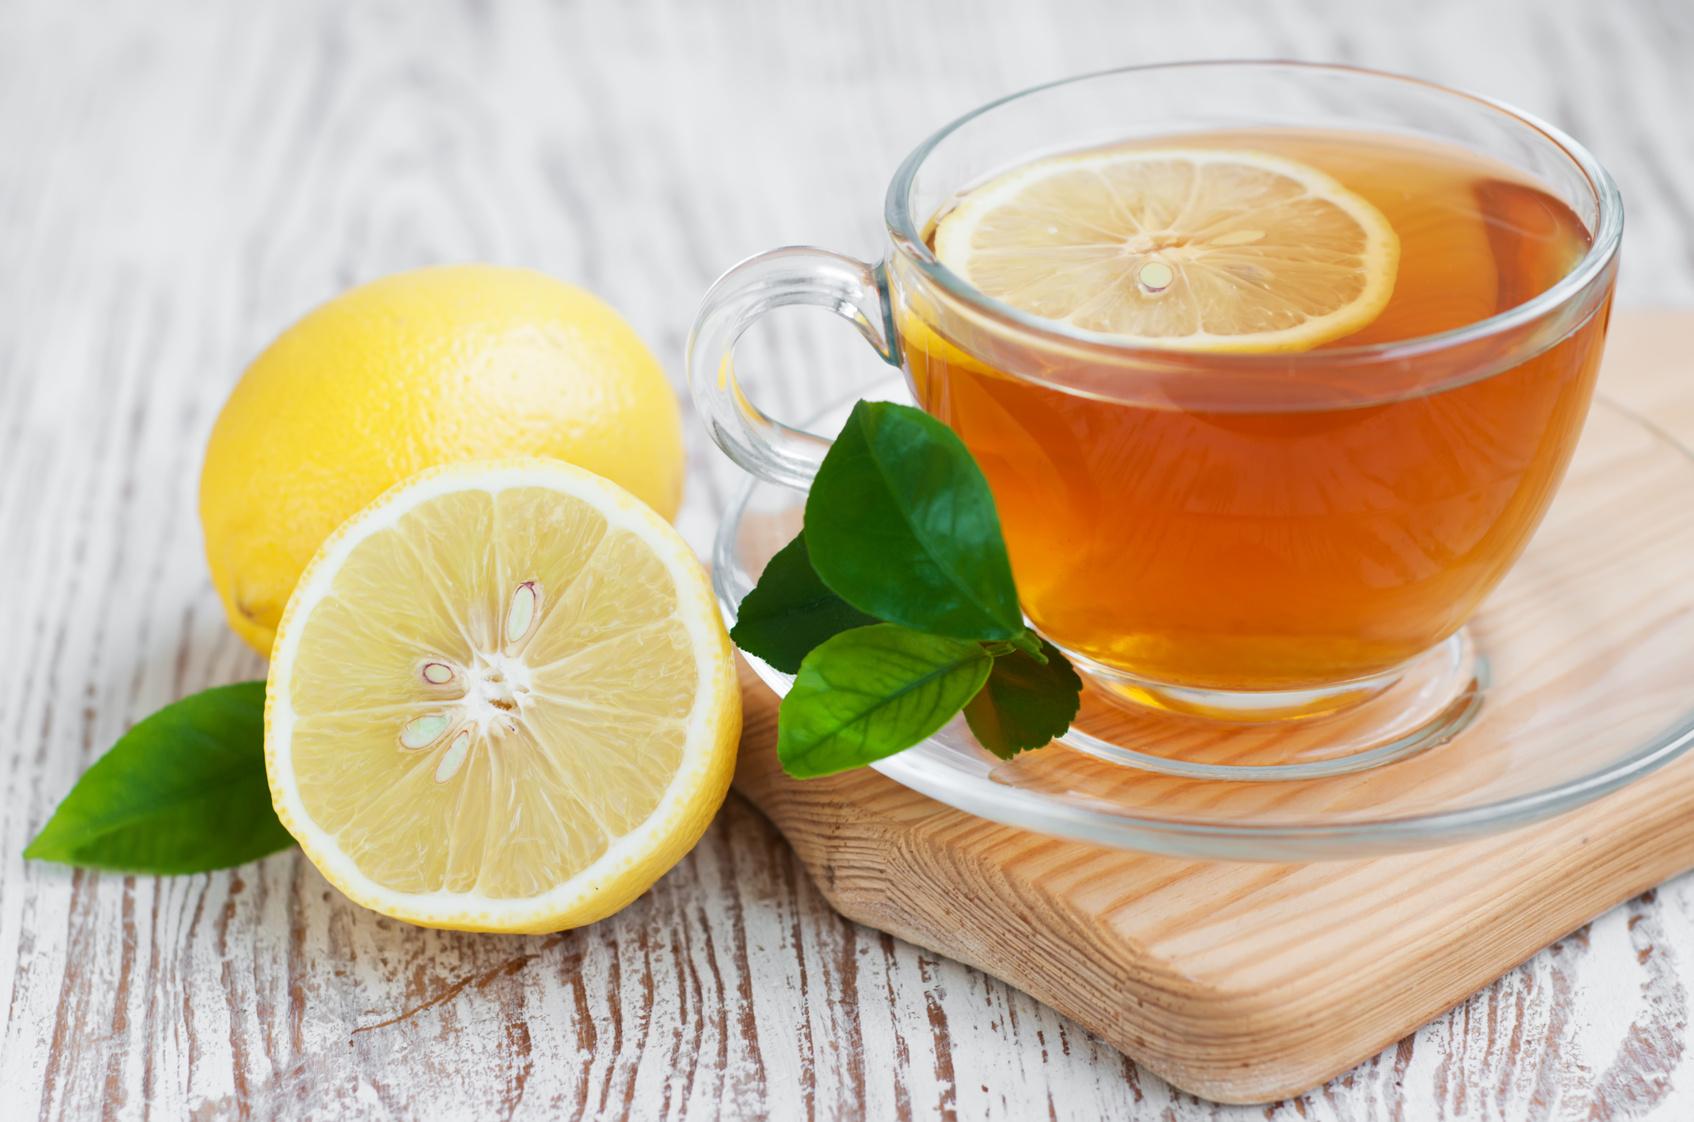 Lemon Tea Wallpapers High Quality | Download Free